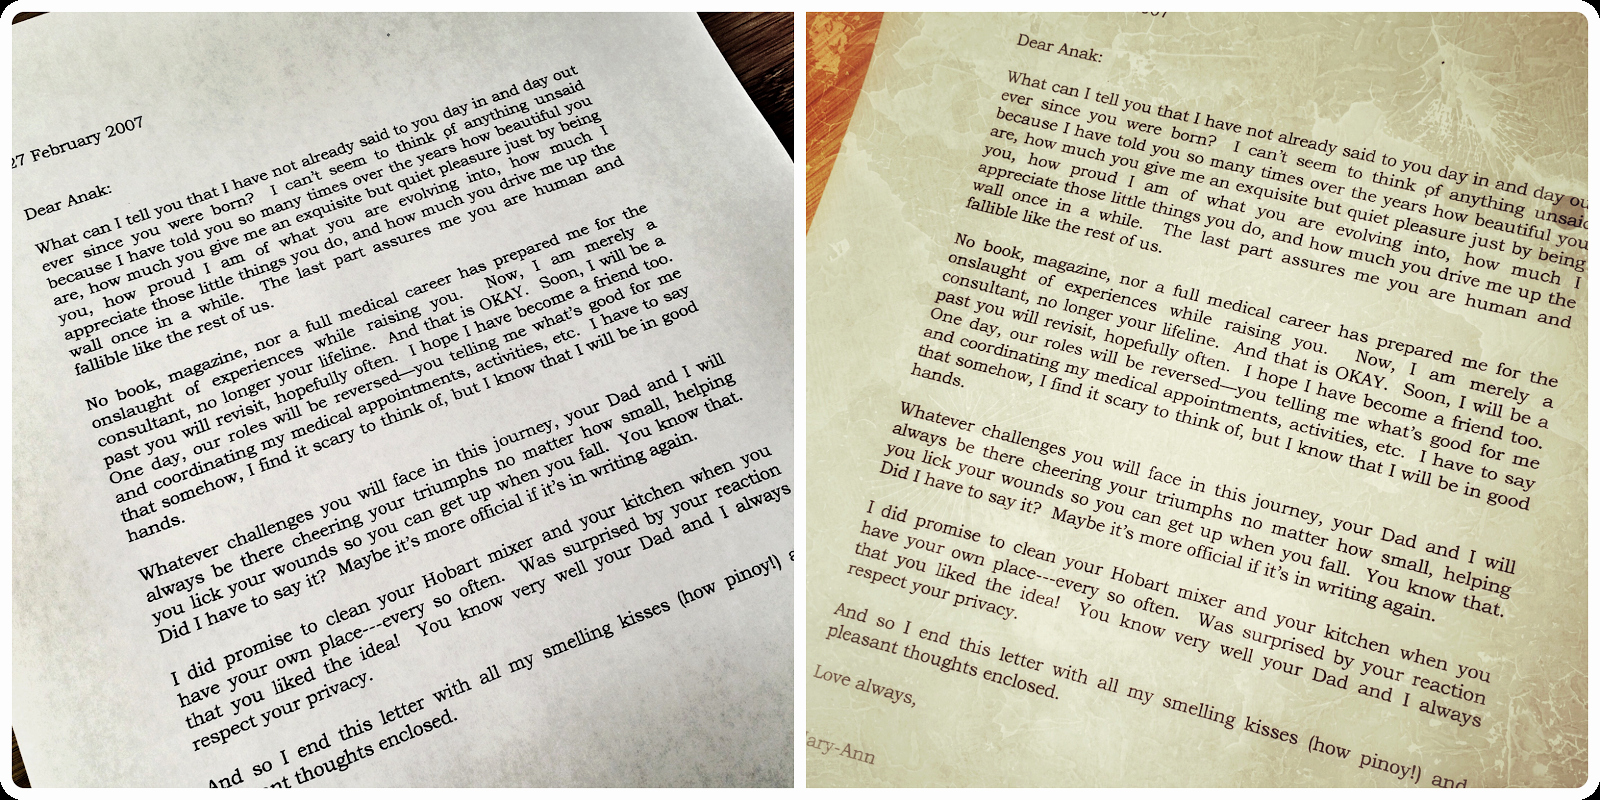 Kairos Retreat Letter Examples Inspirational Kairos Retreat Letter Examples